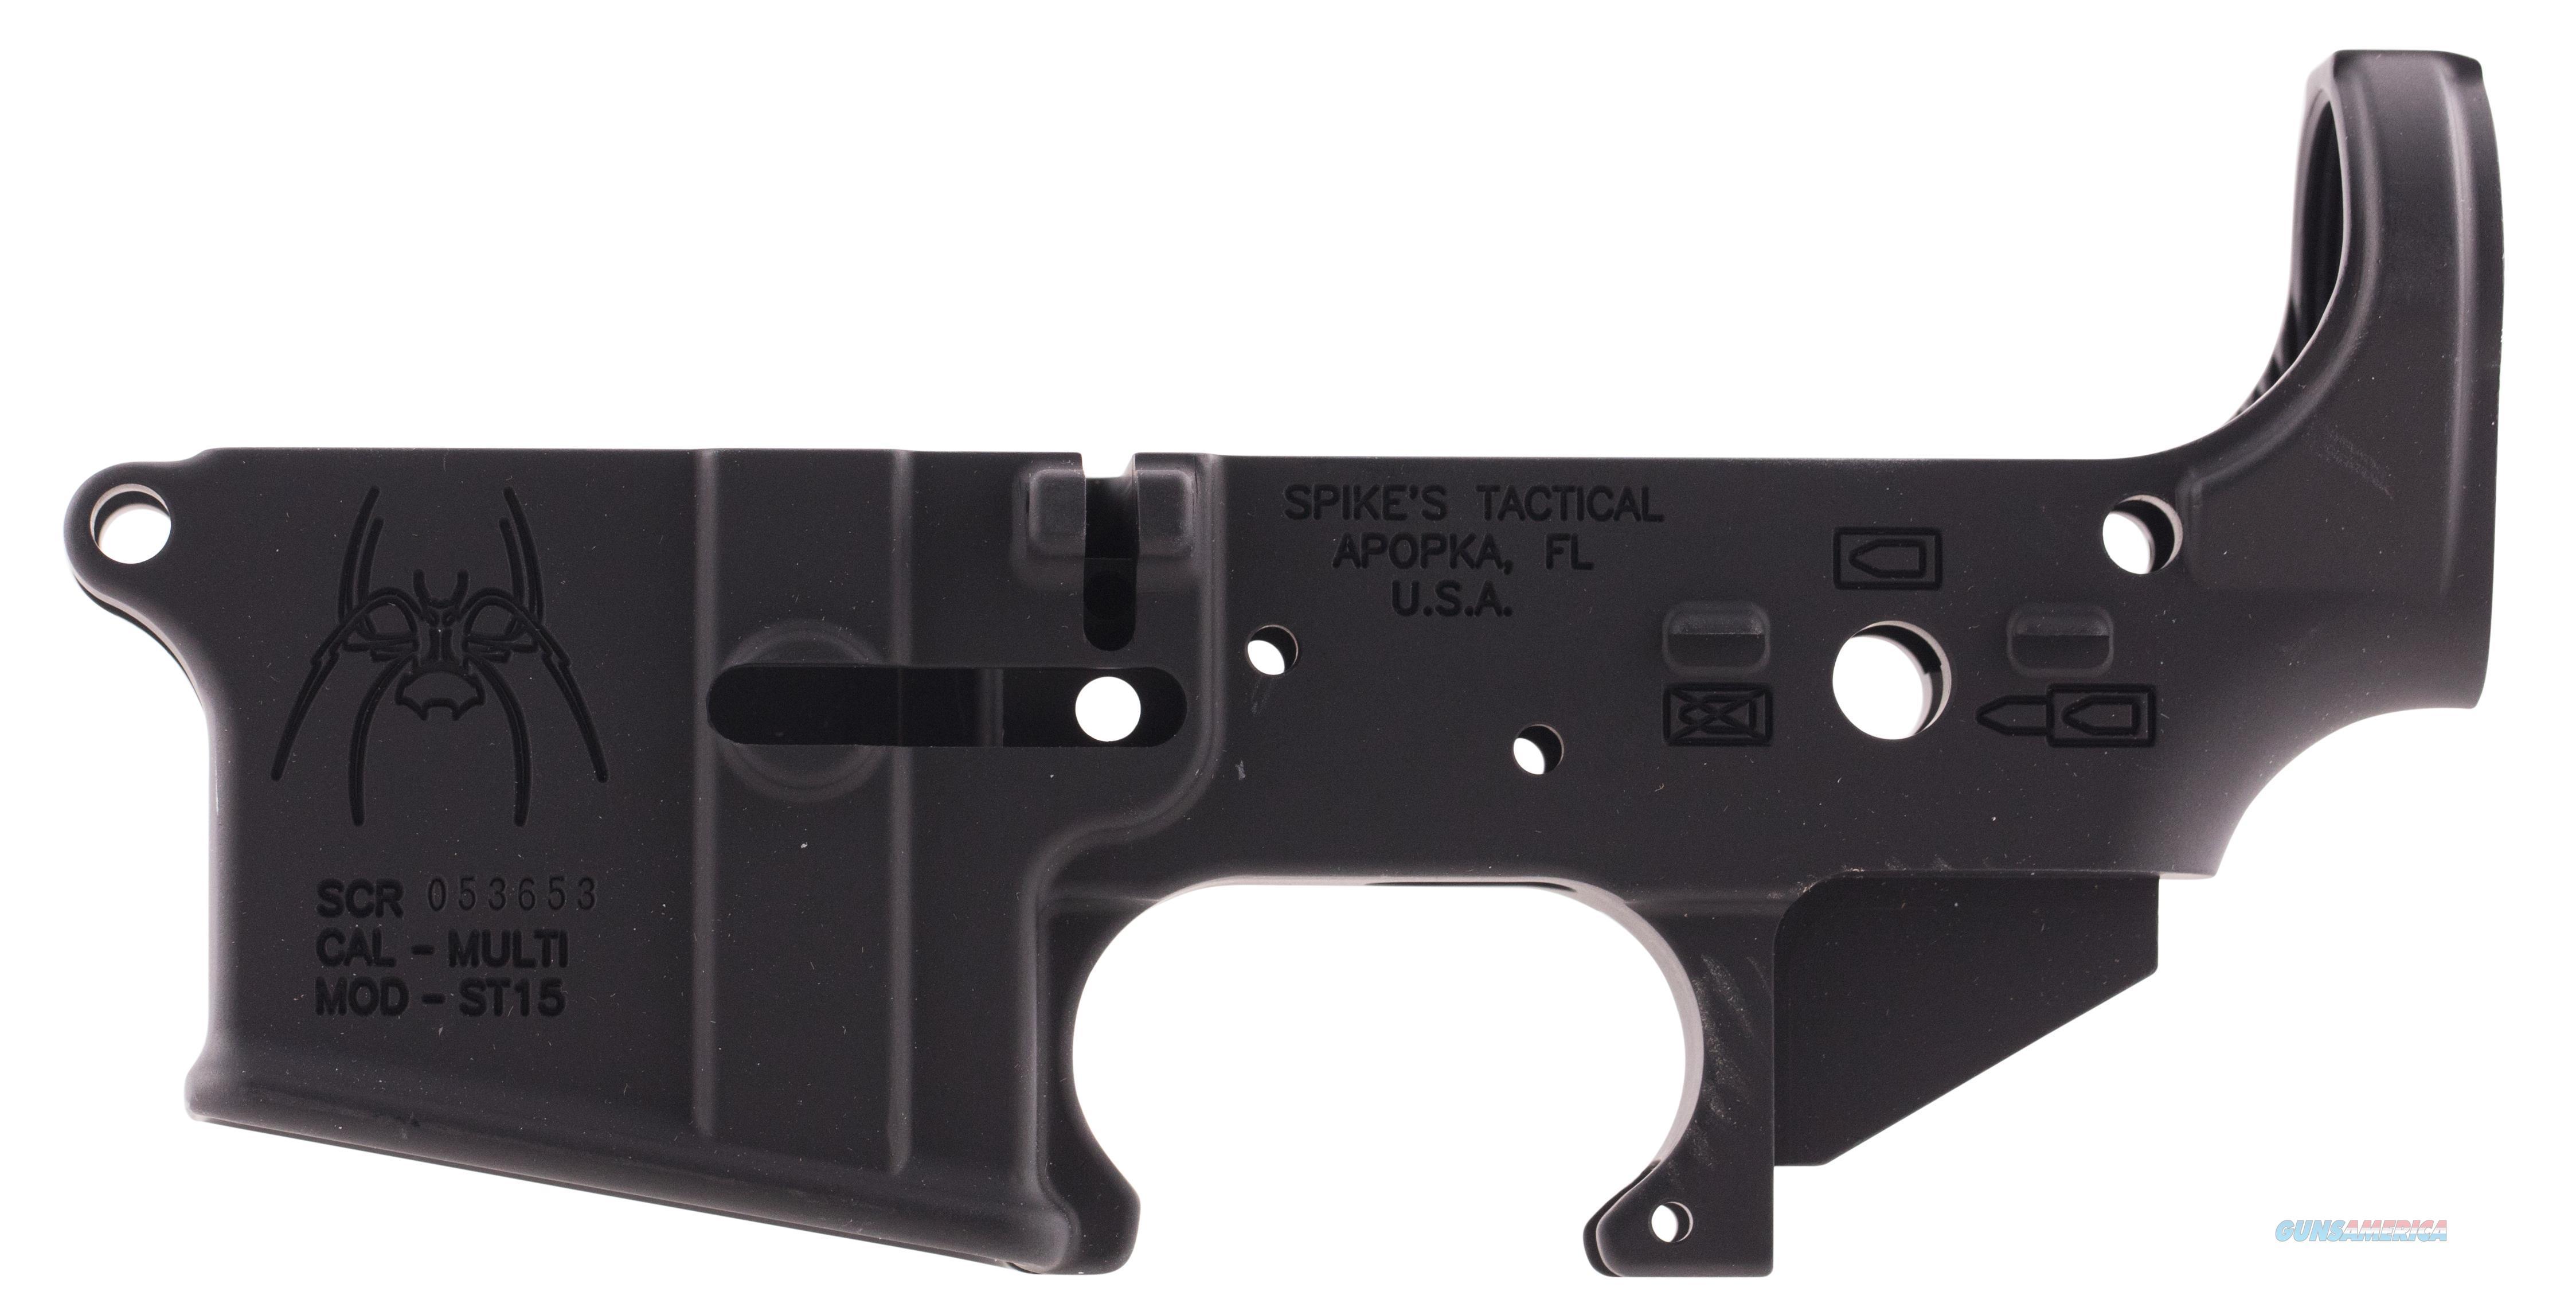 Spikes Stls019 Stripped Lower Spider Bullet Markings Ar Platform Rifle Multi-Caliber Black Hardcoat Anodized STLS019  Guns > Rifles > S Misc Rifles